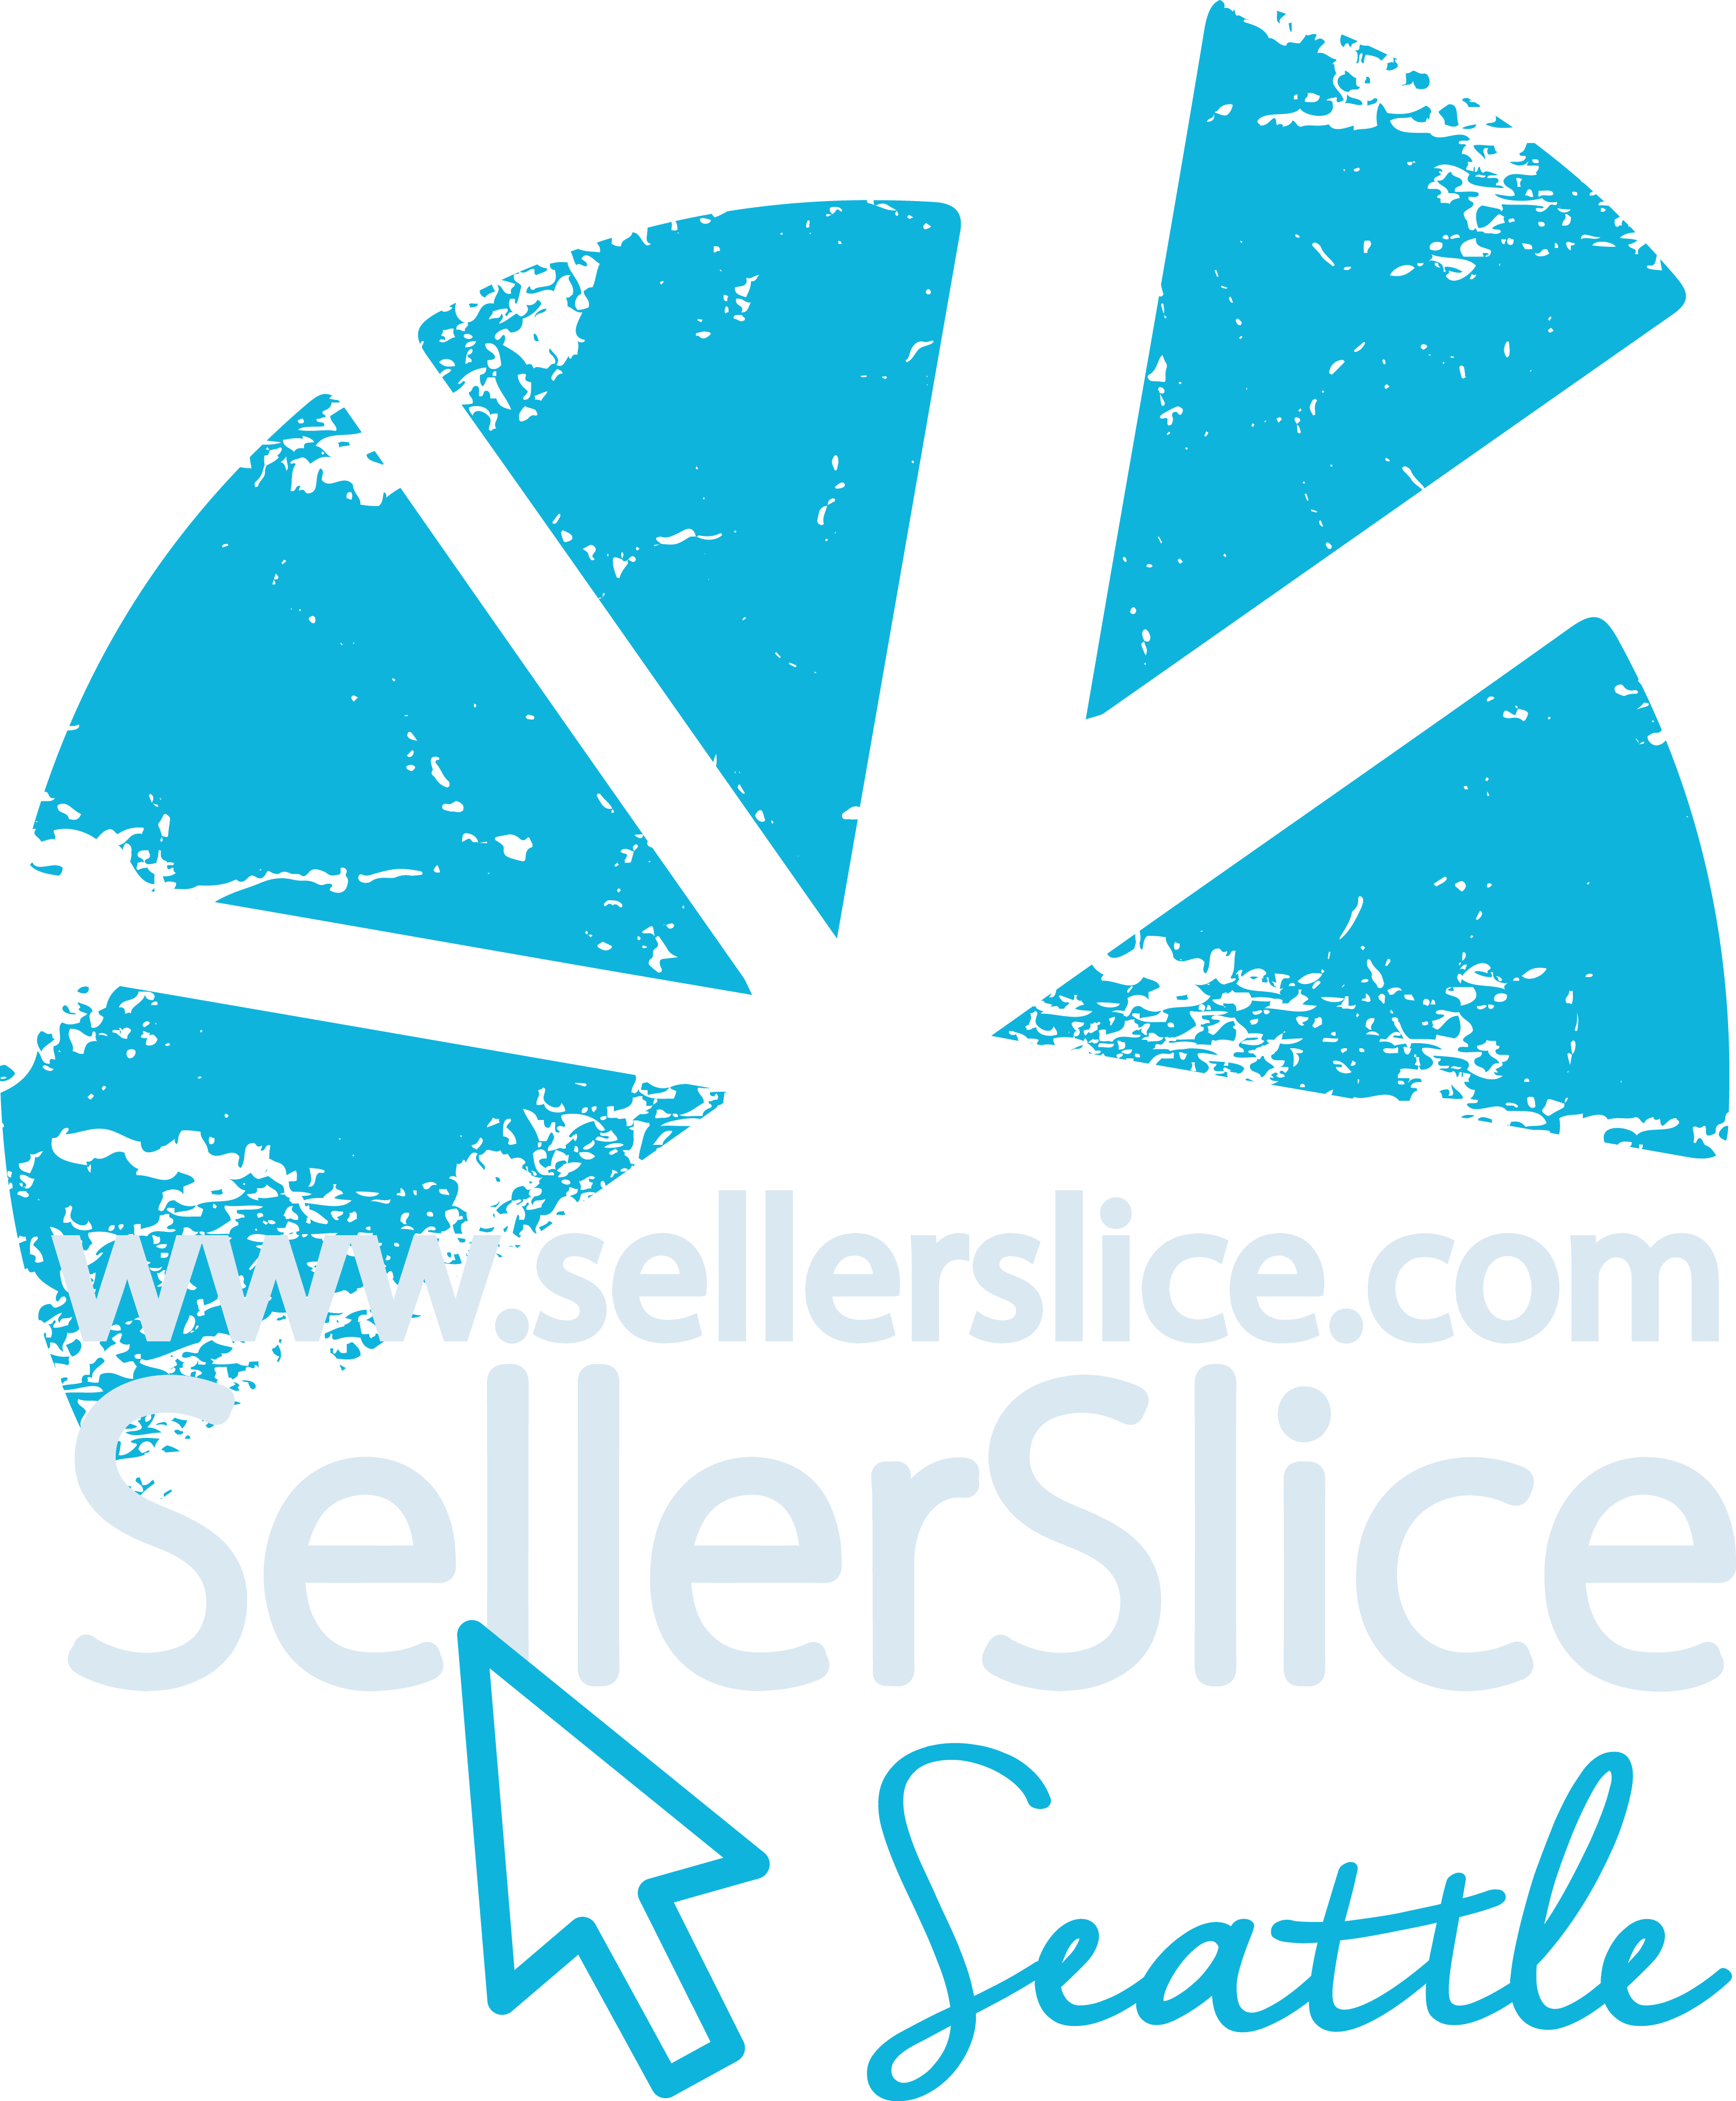 SellerSlice